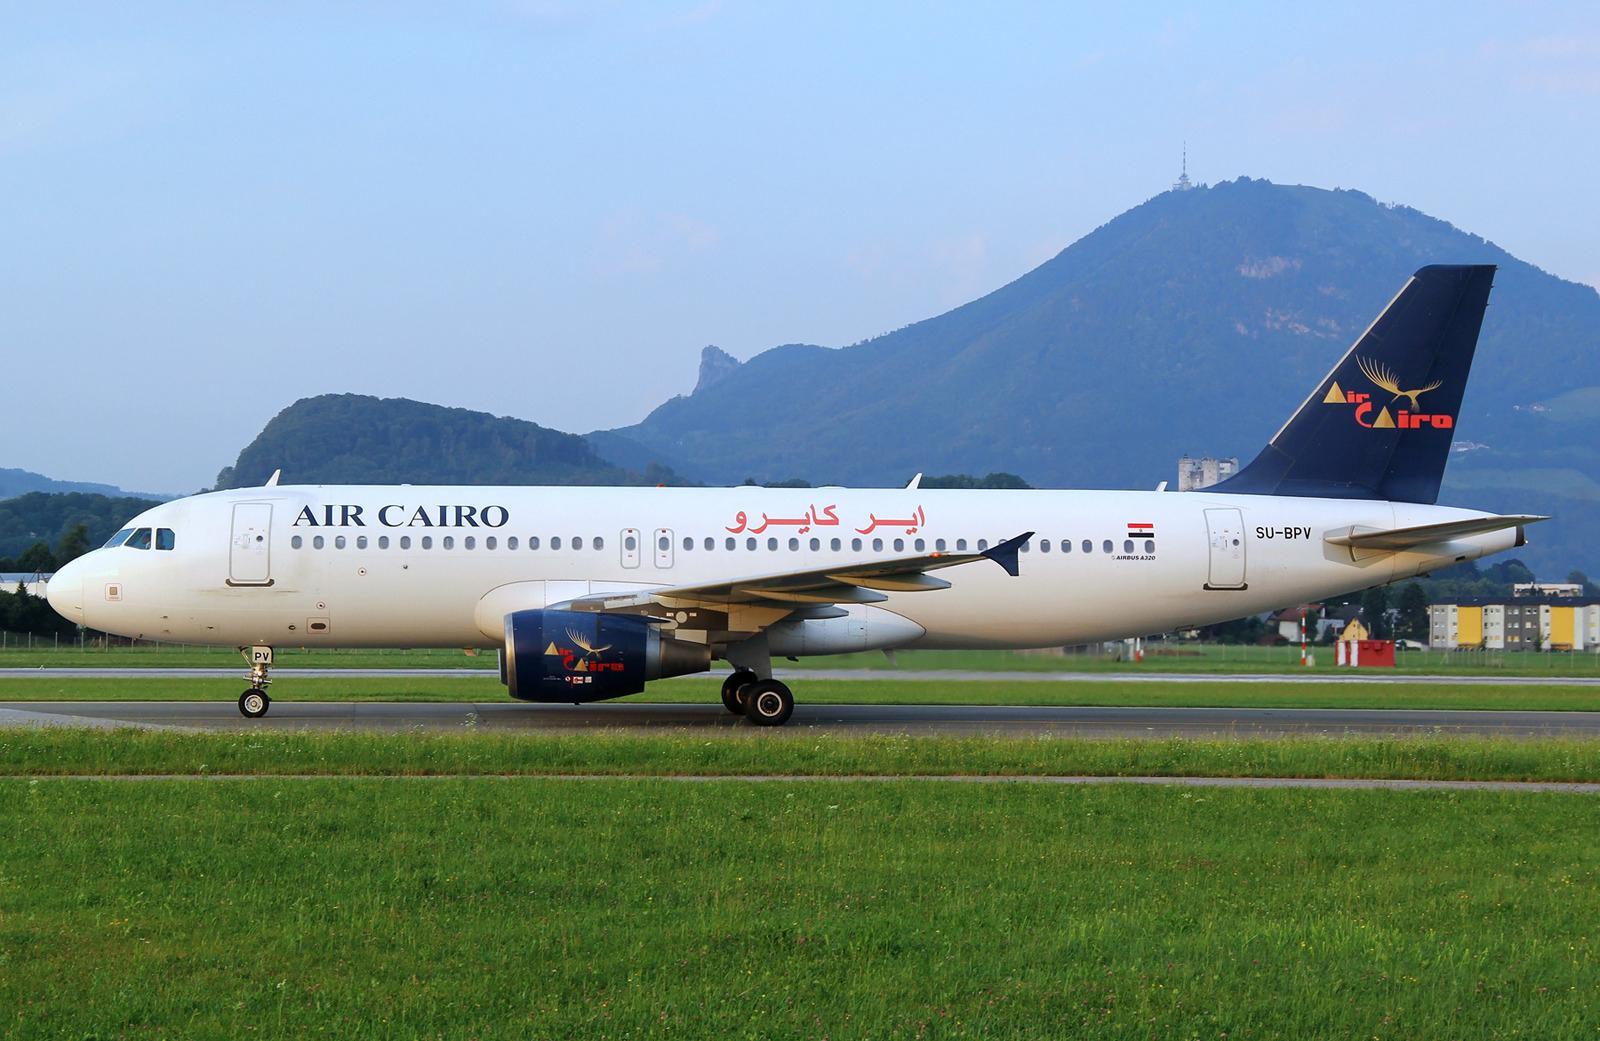 air cairo - ავიაკომპანია ეარკაირო - Air Cairo